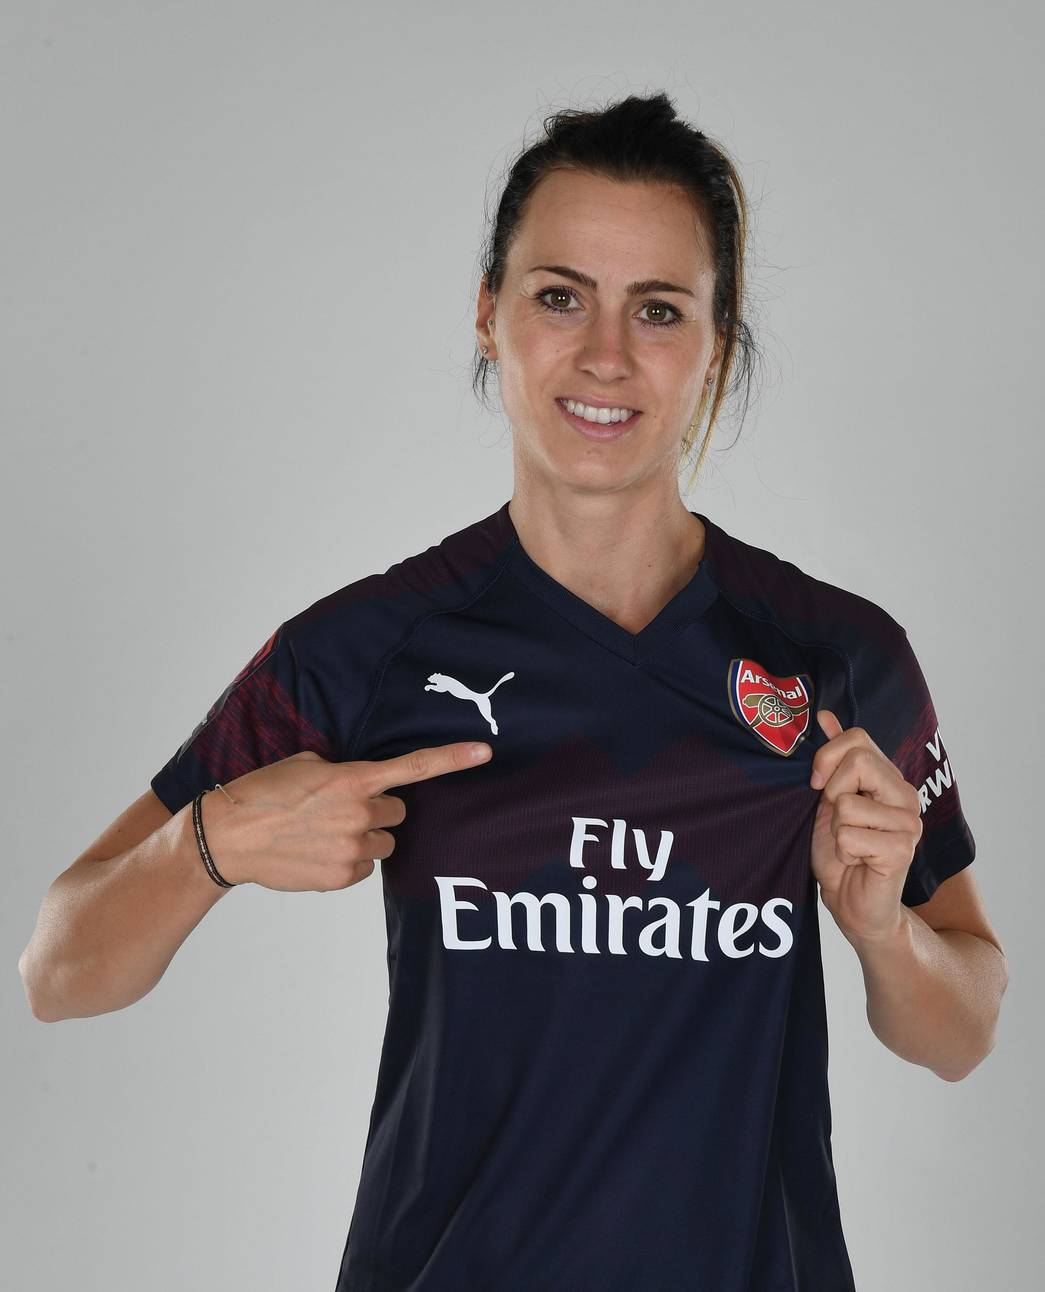 d9236bb3b Arsenal Women model PUMA 2018 19 away kit